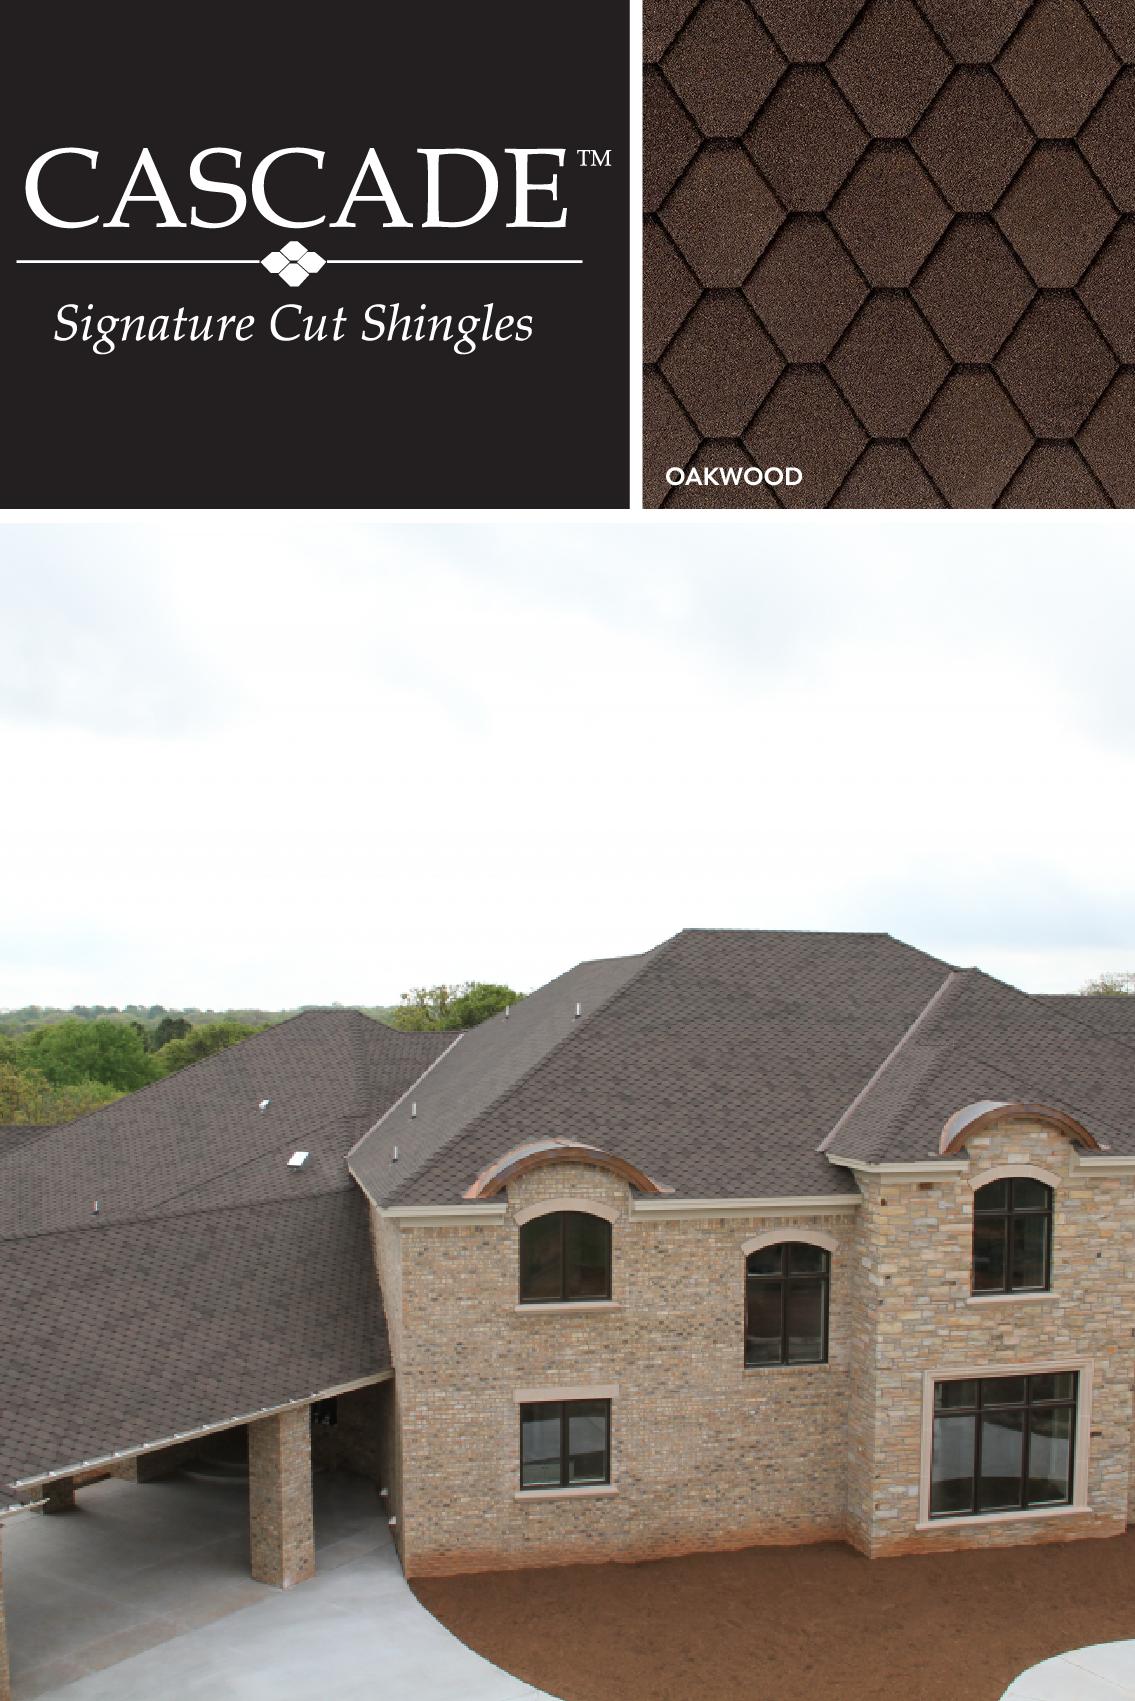 Pin On Cascade Signature Cut Shingles